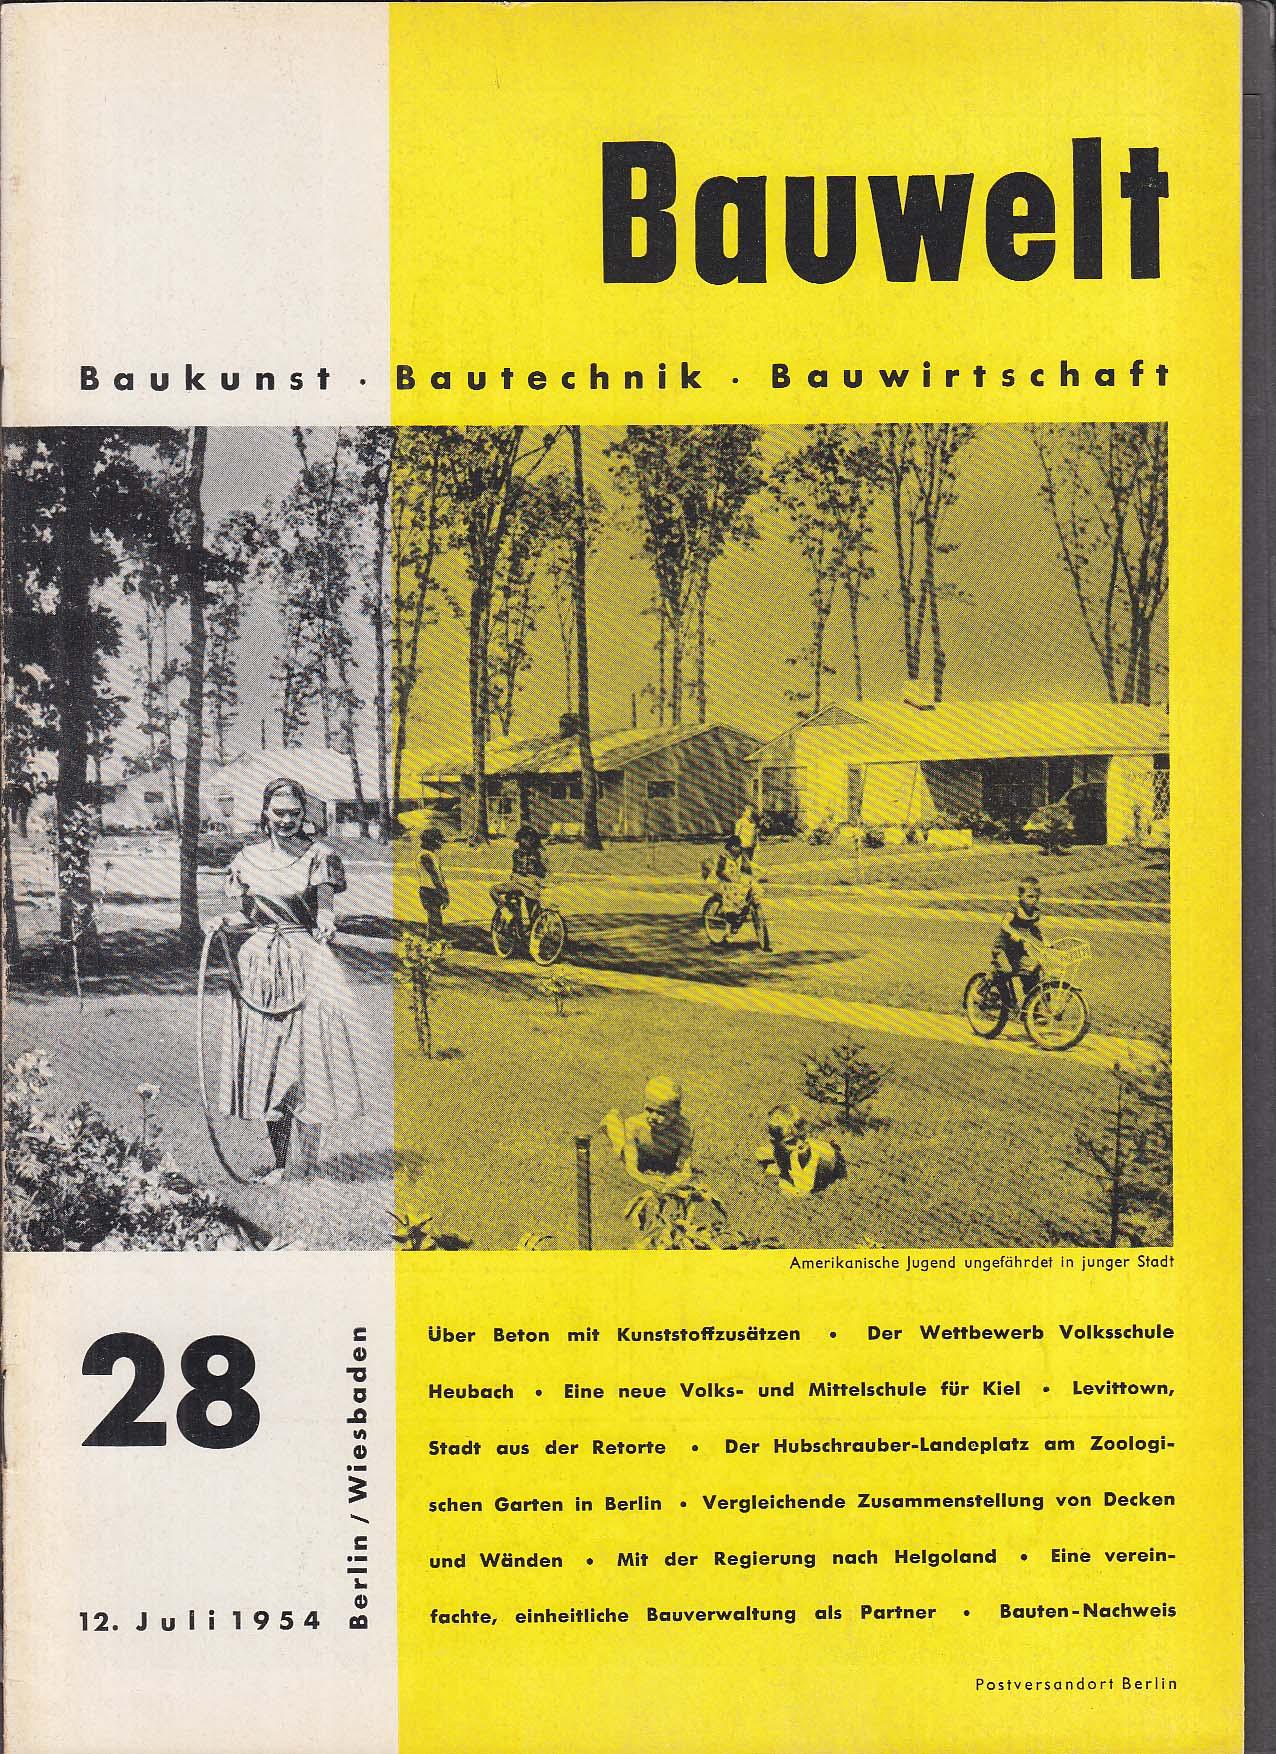 Bauwelt German architecture magazine 7/12/1954 28